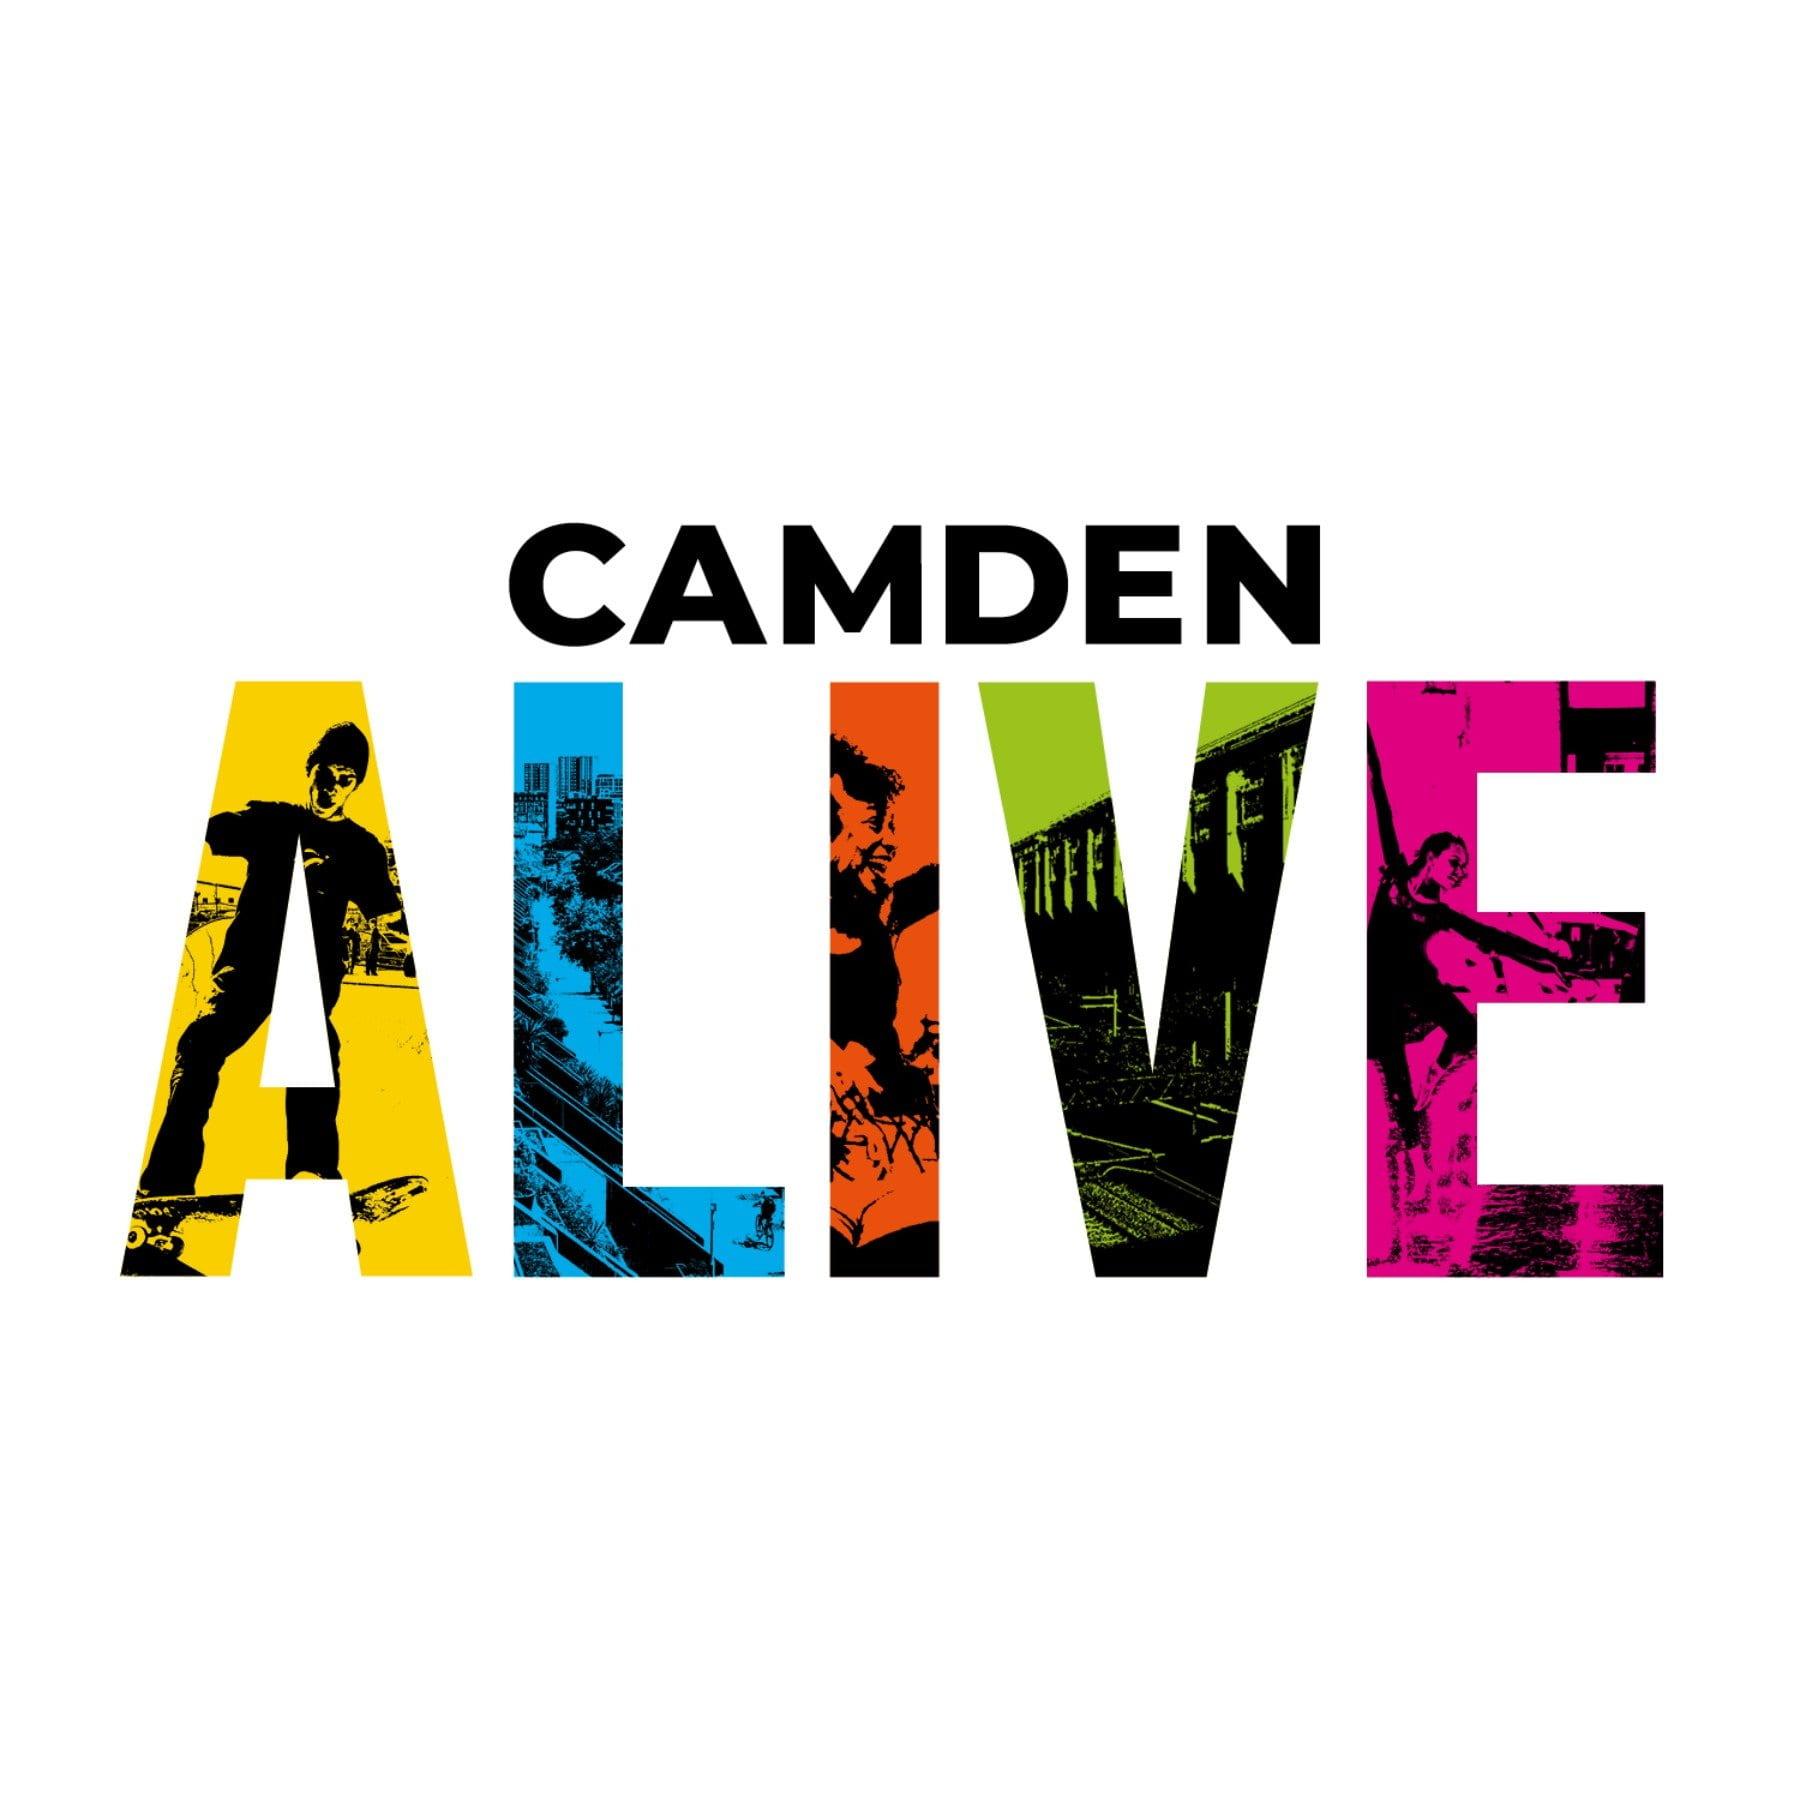 Camden Alive